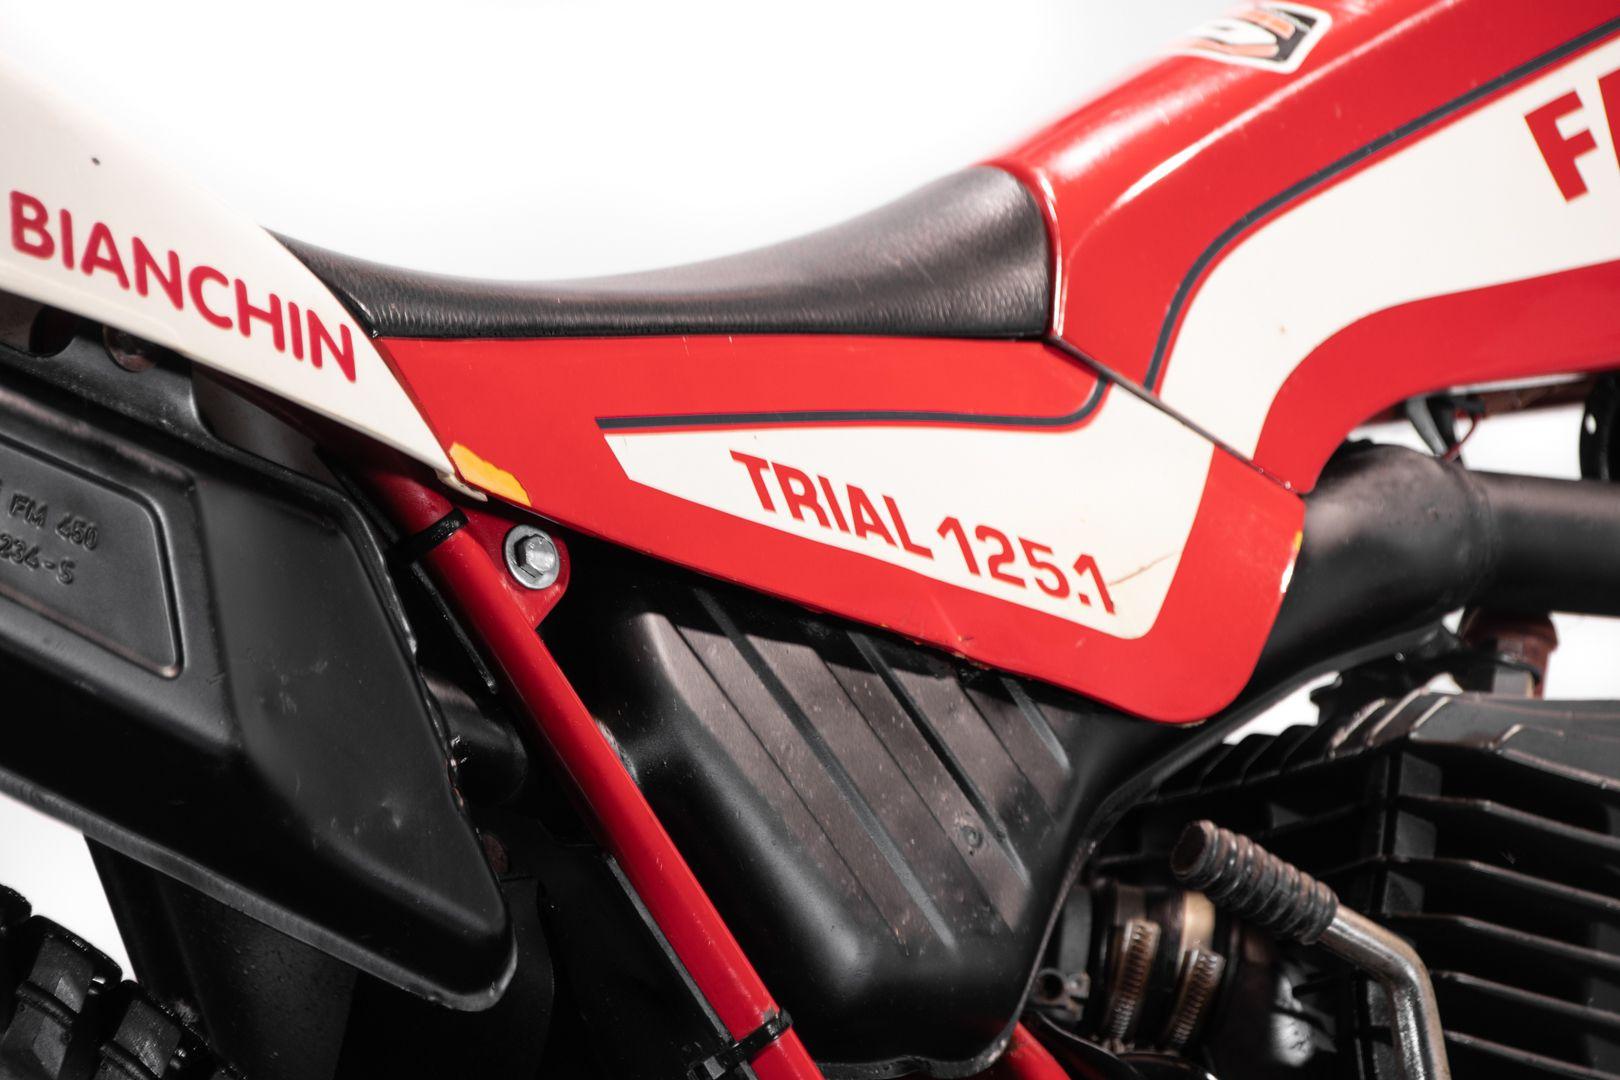 1986 Fantic Motor Trial 125 Professional 237 69041